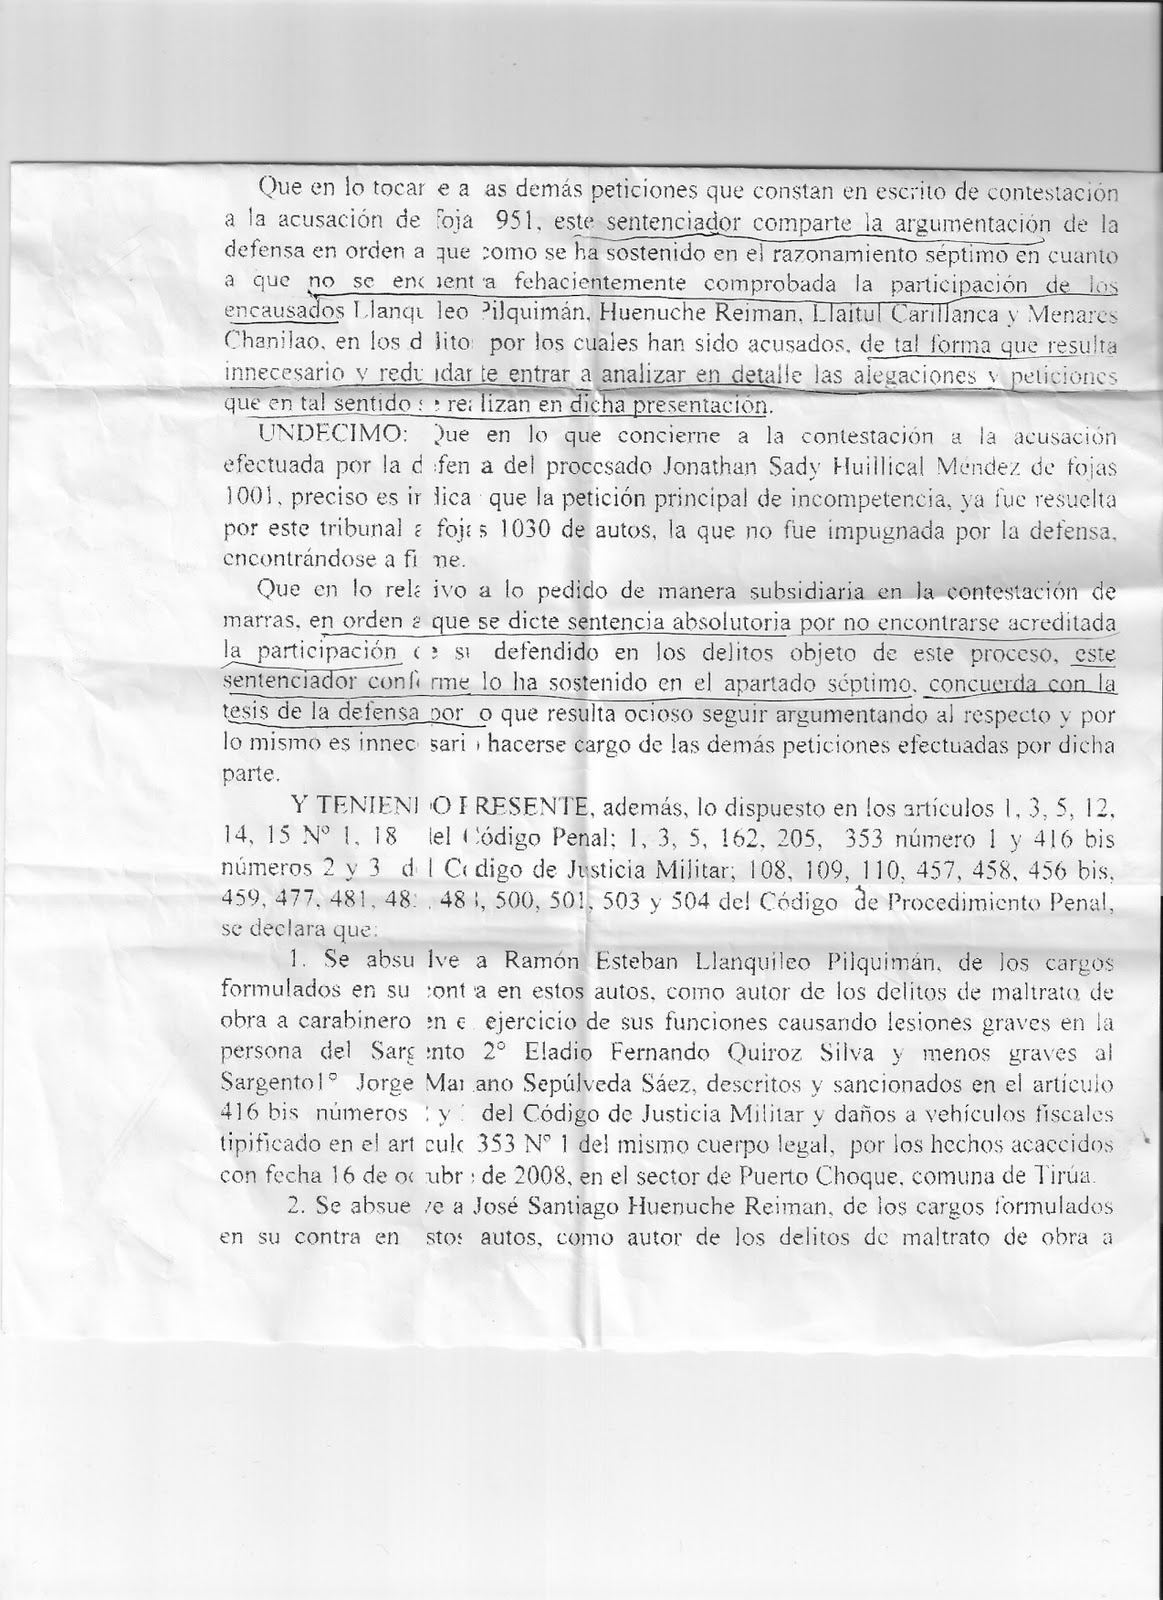 Presos politicos mapuche coordinadora arauco malleco sentencia juzgado militar de valdivia for Juzgado togado militar